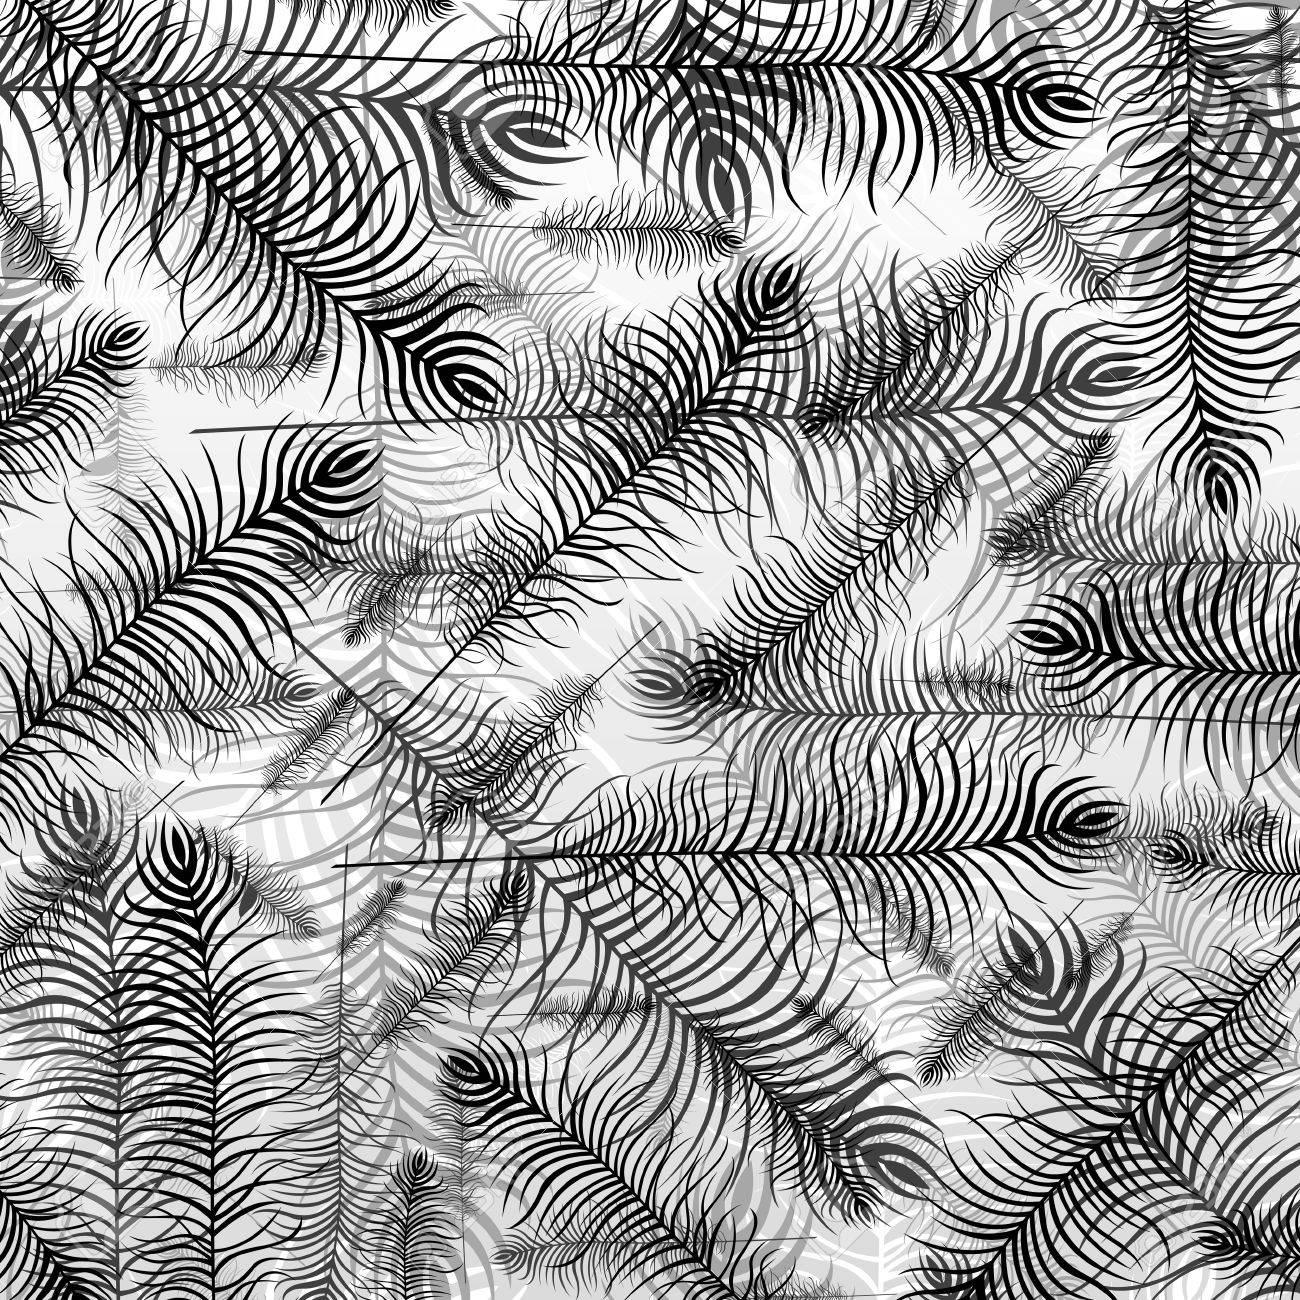 Peacock bird feathers background illustration Stock Vector - 11649857